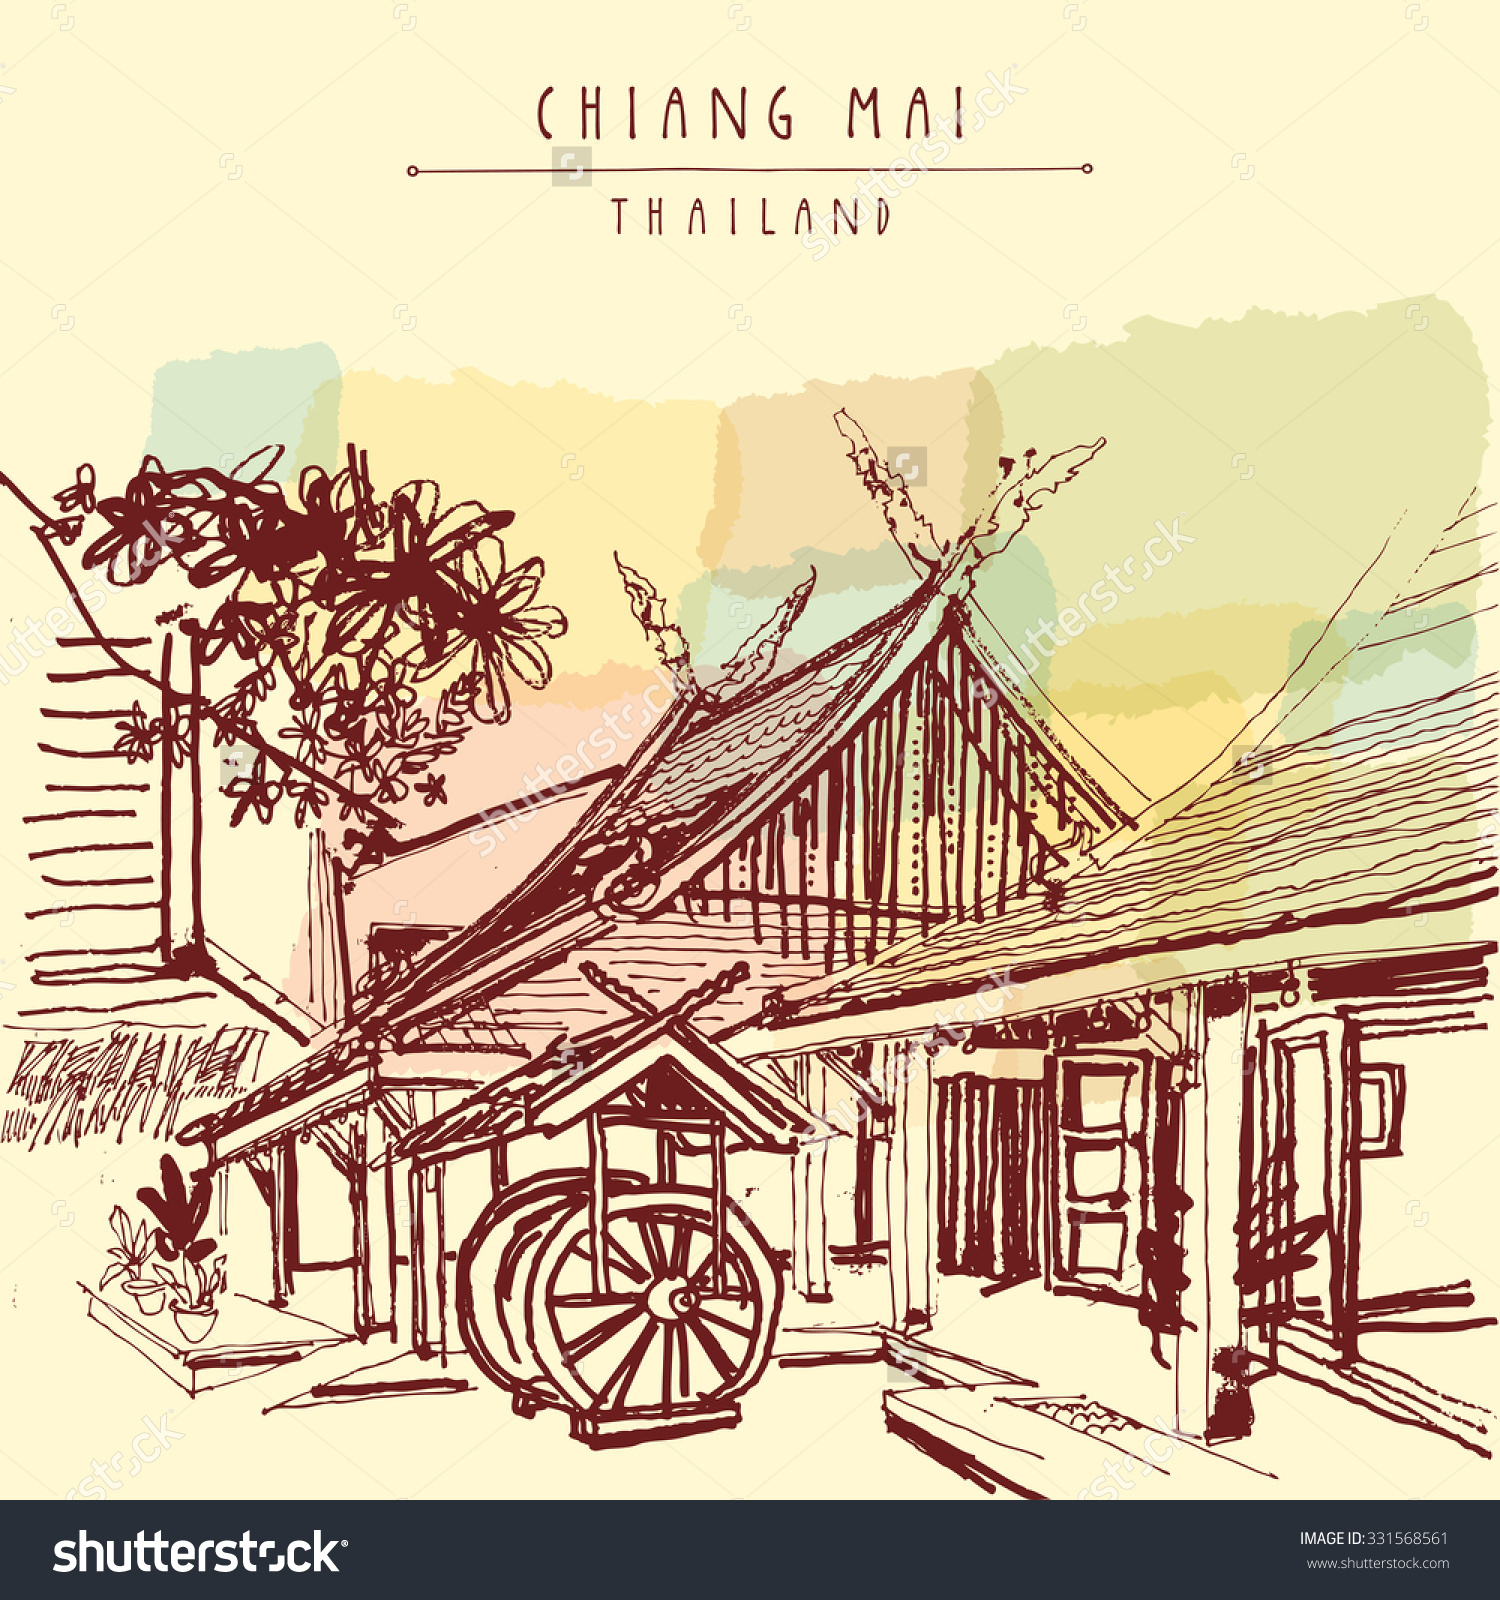 Chiang mai clipart #7